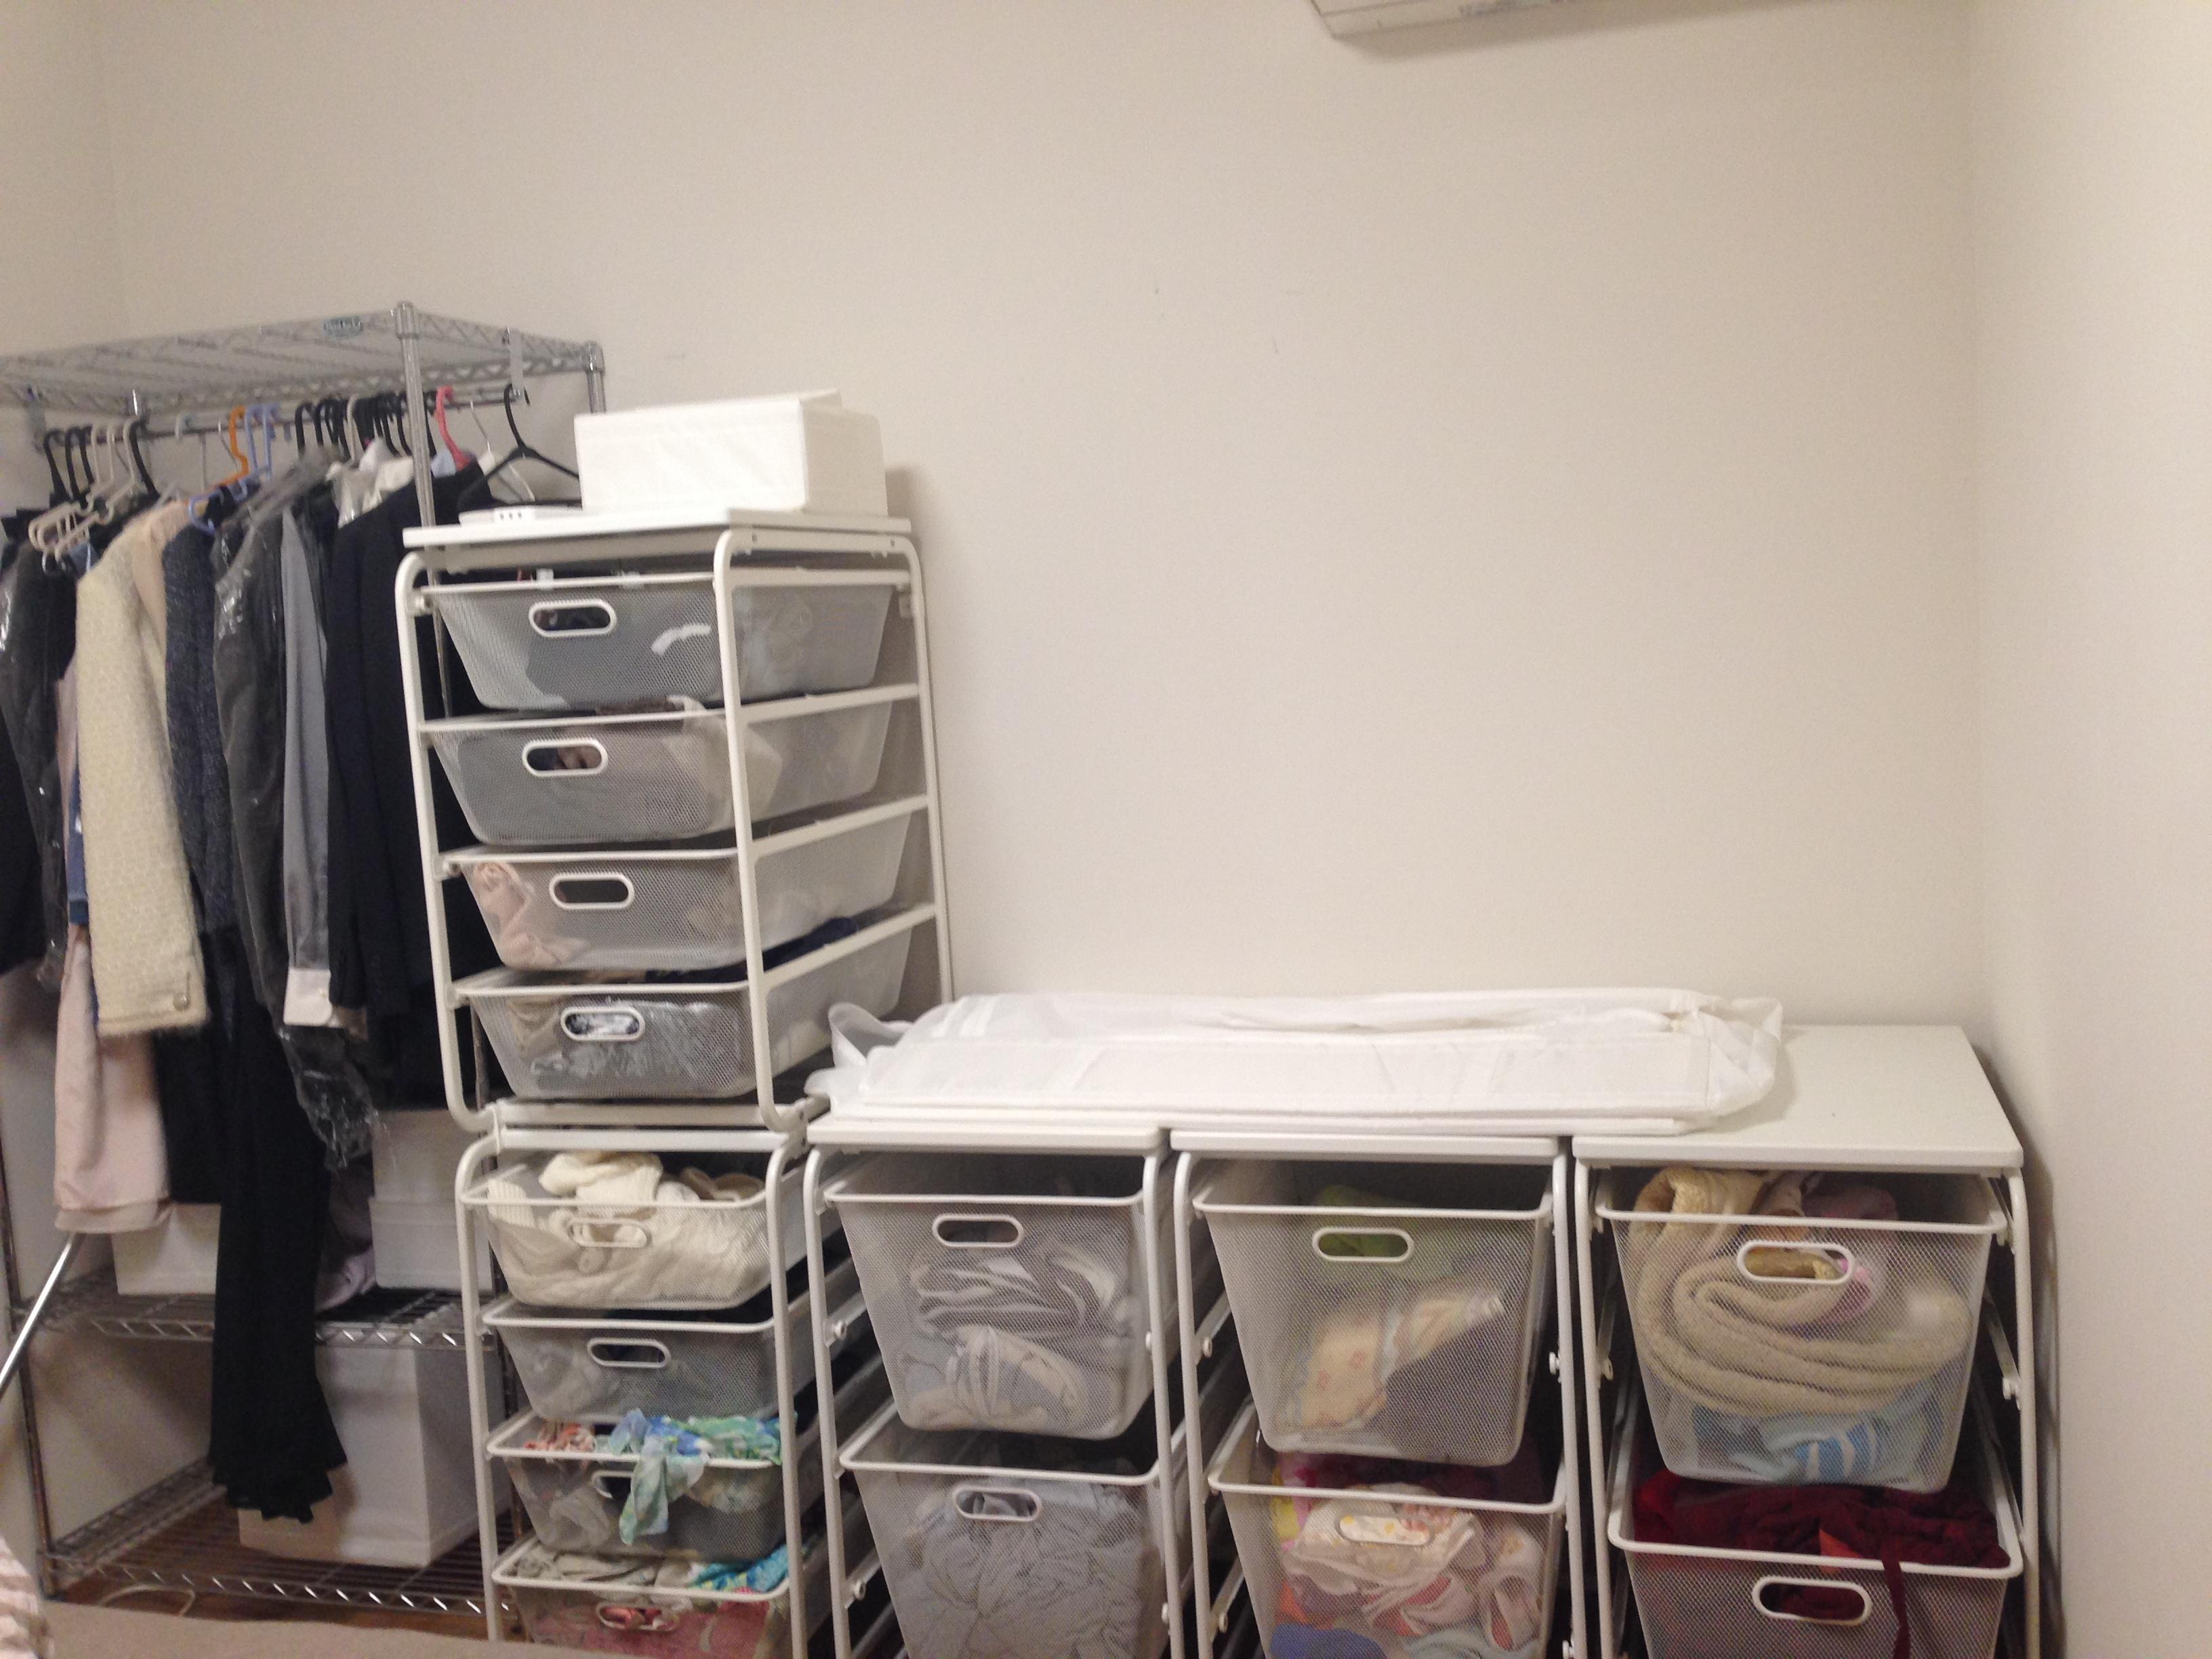 IKEA「ALGOT」シリーズを利用した寝室クローゼット収納。